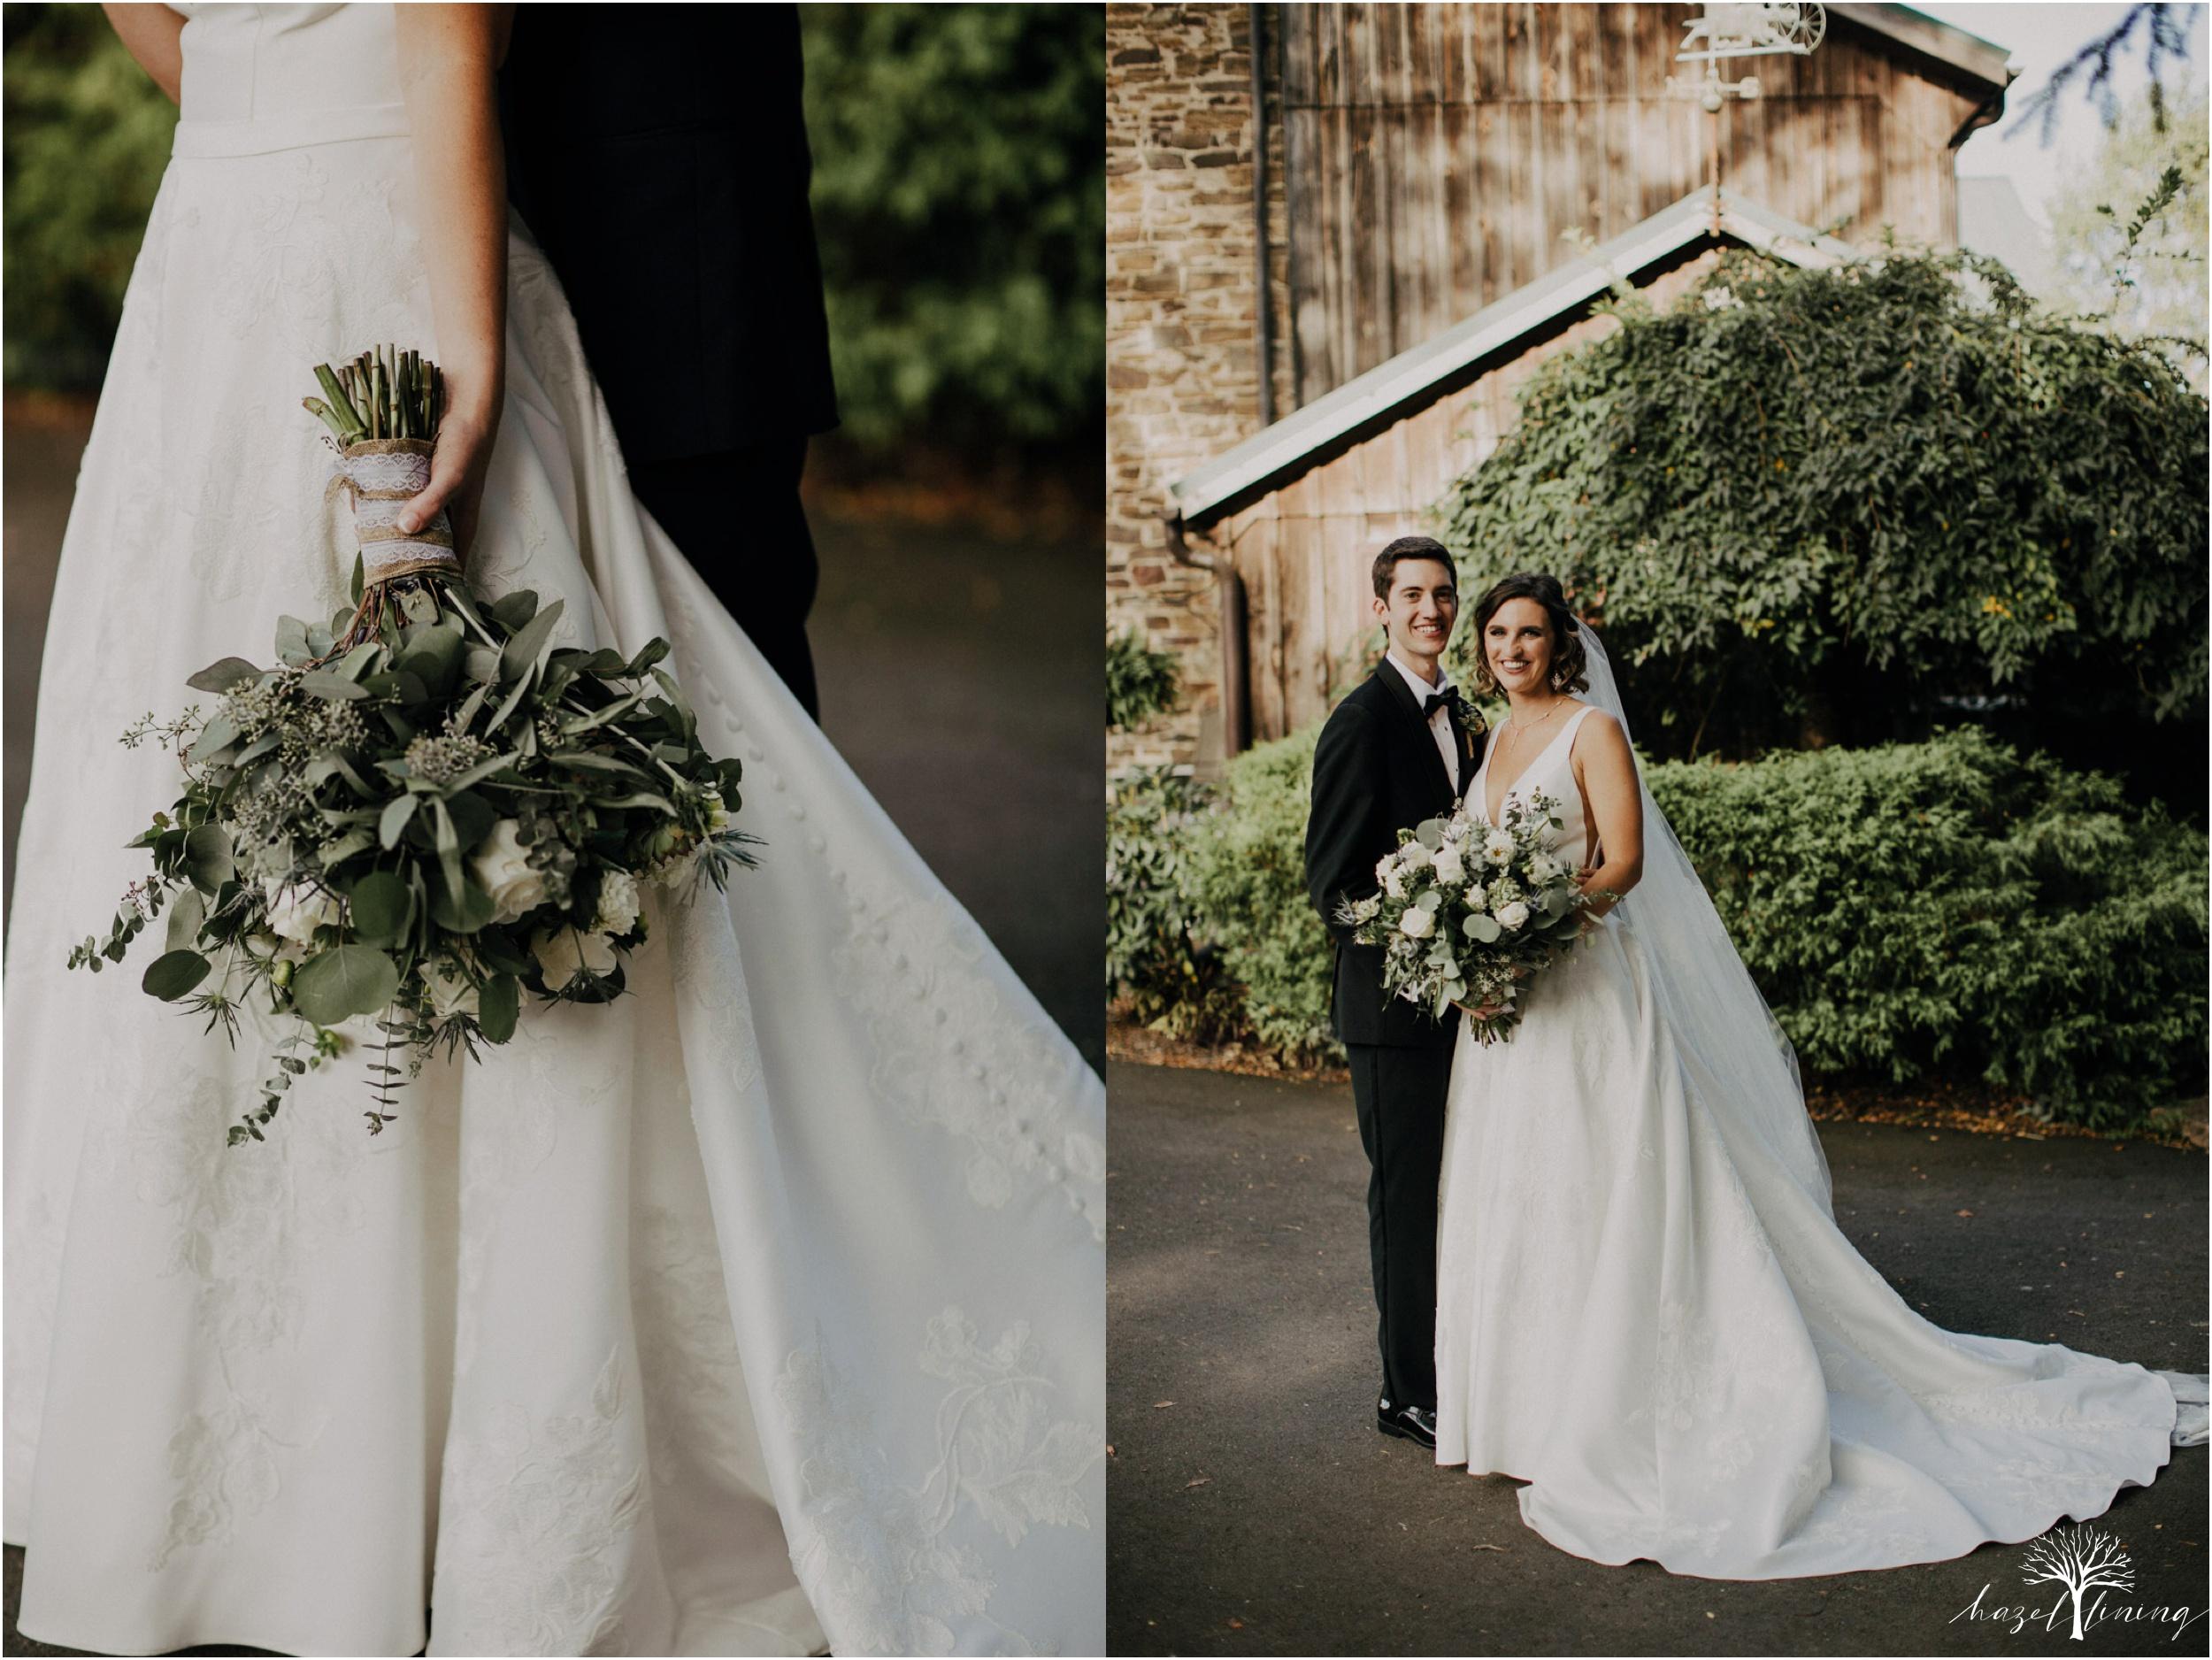 maureen-hepner-anthony-giordano-rose-bank-winery-newtow-pennsylvania-luxury-summer-wedding-hazel-lining-photography-destination-elopement-wedding-engagement-photography_0103.jpg